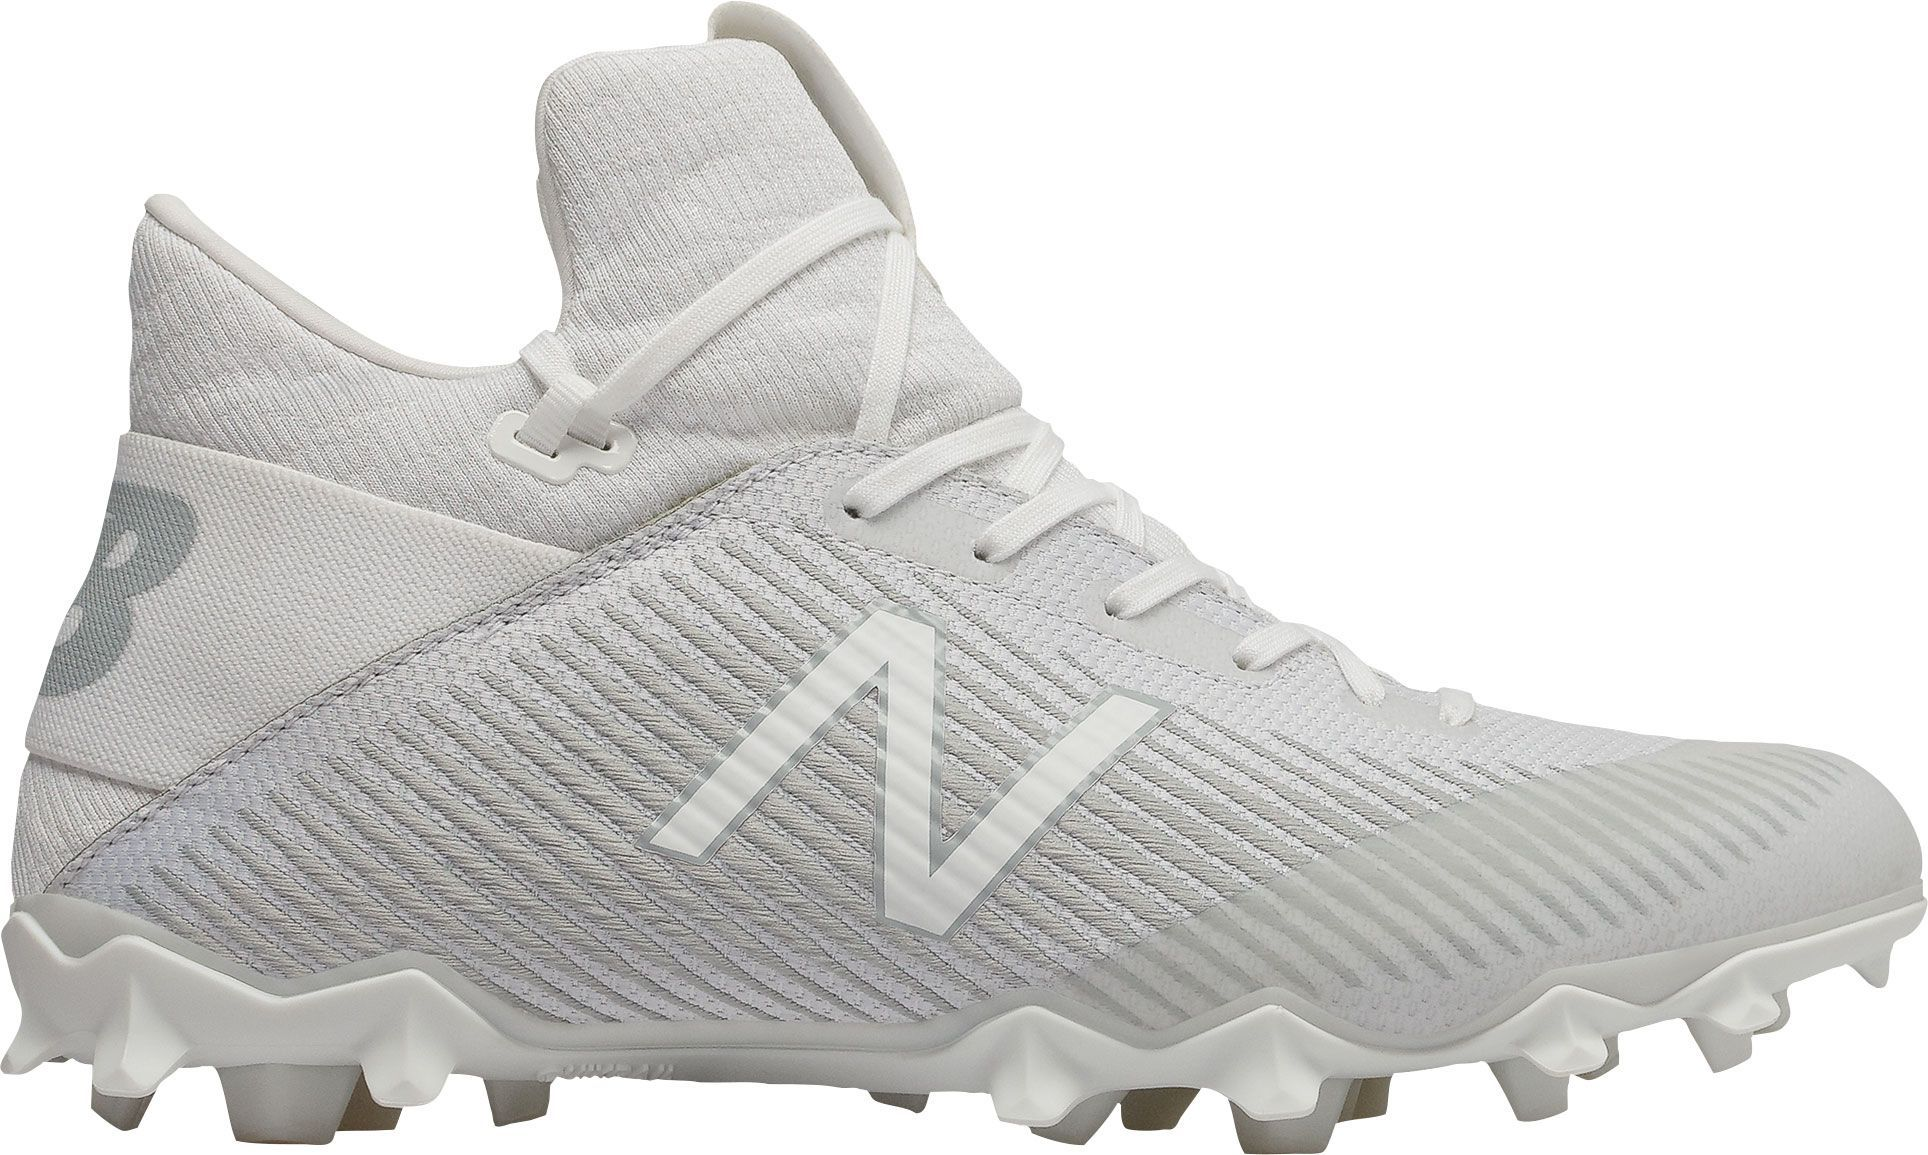 73cb130f9f81 New Balance Men's Freeze LX 2.0 Lacrosse Cleats, Size: 6.5, White ...